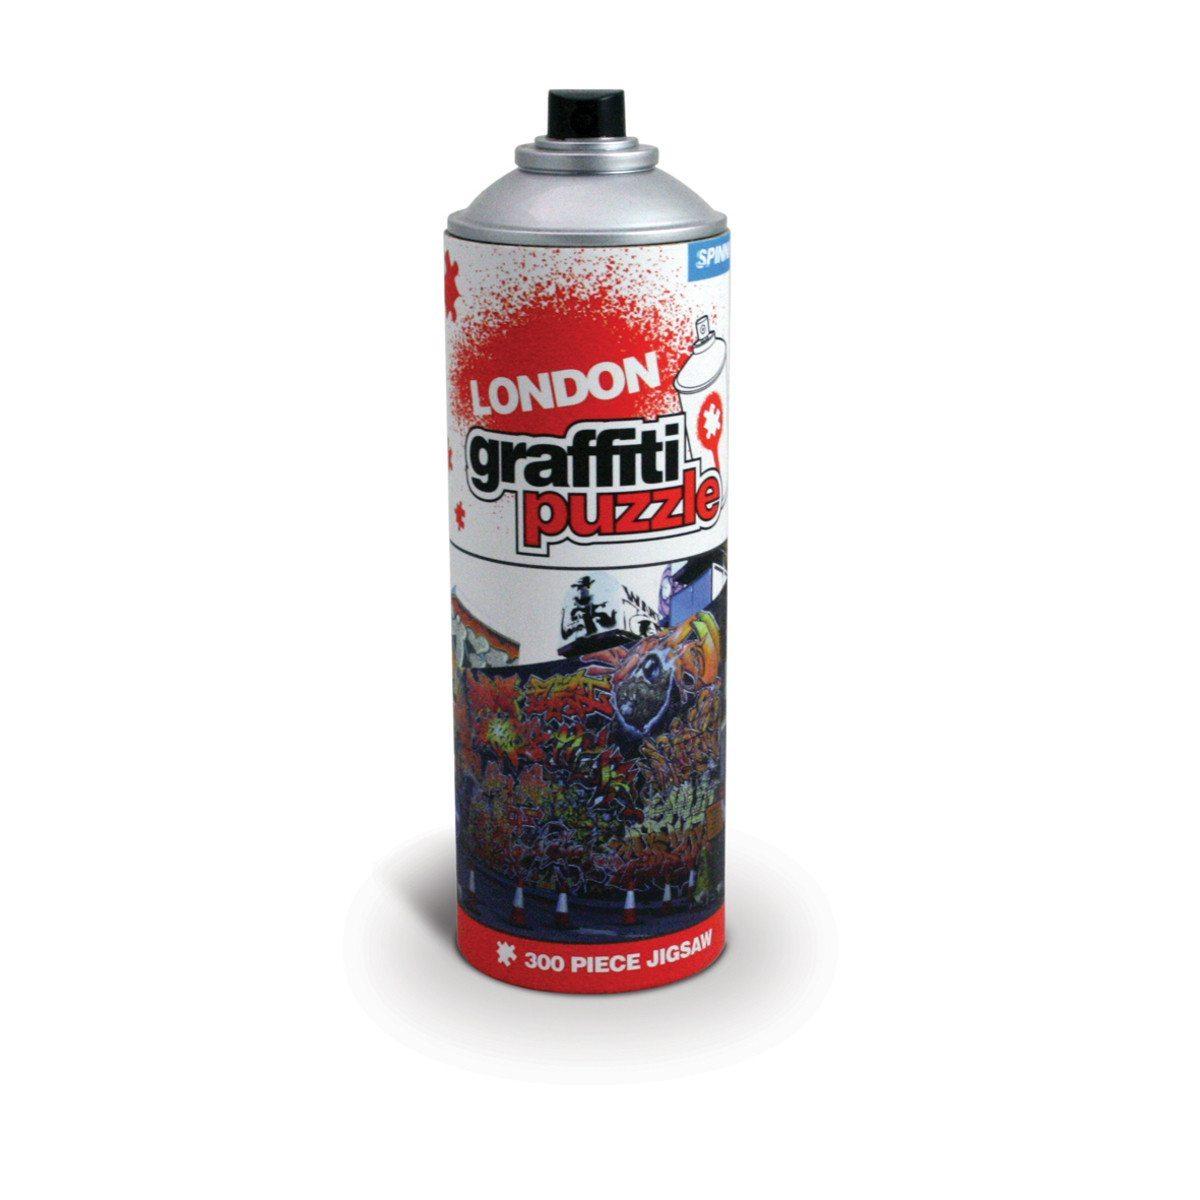 Graffiti-Puzzle: London